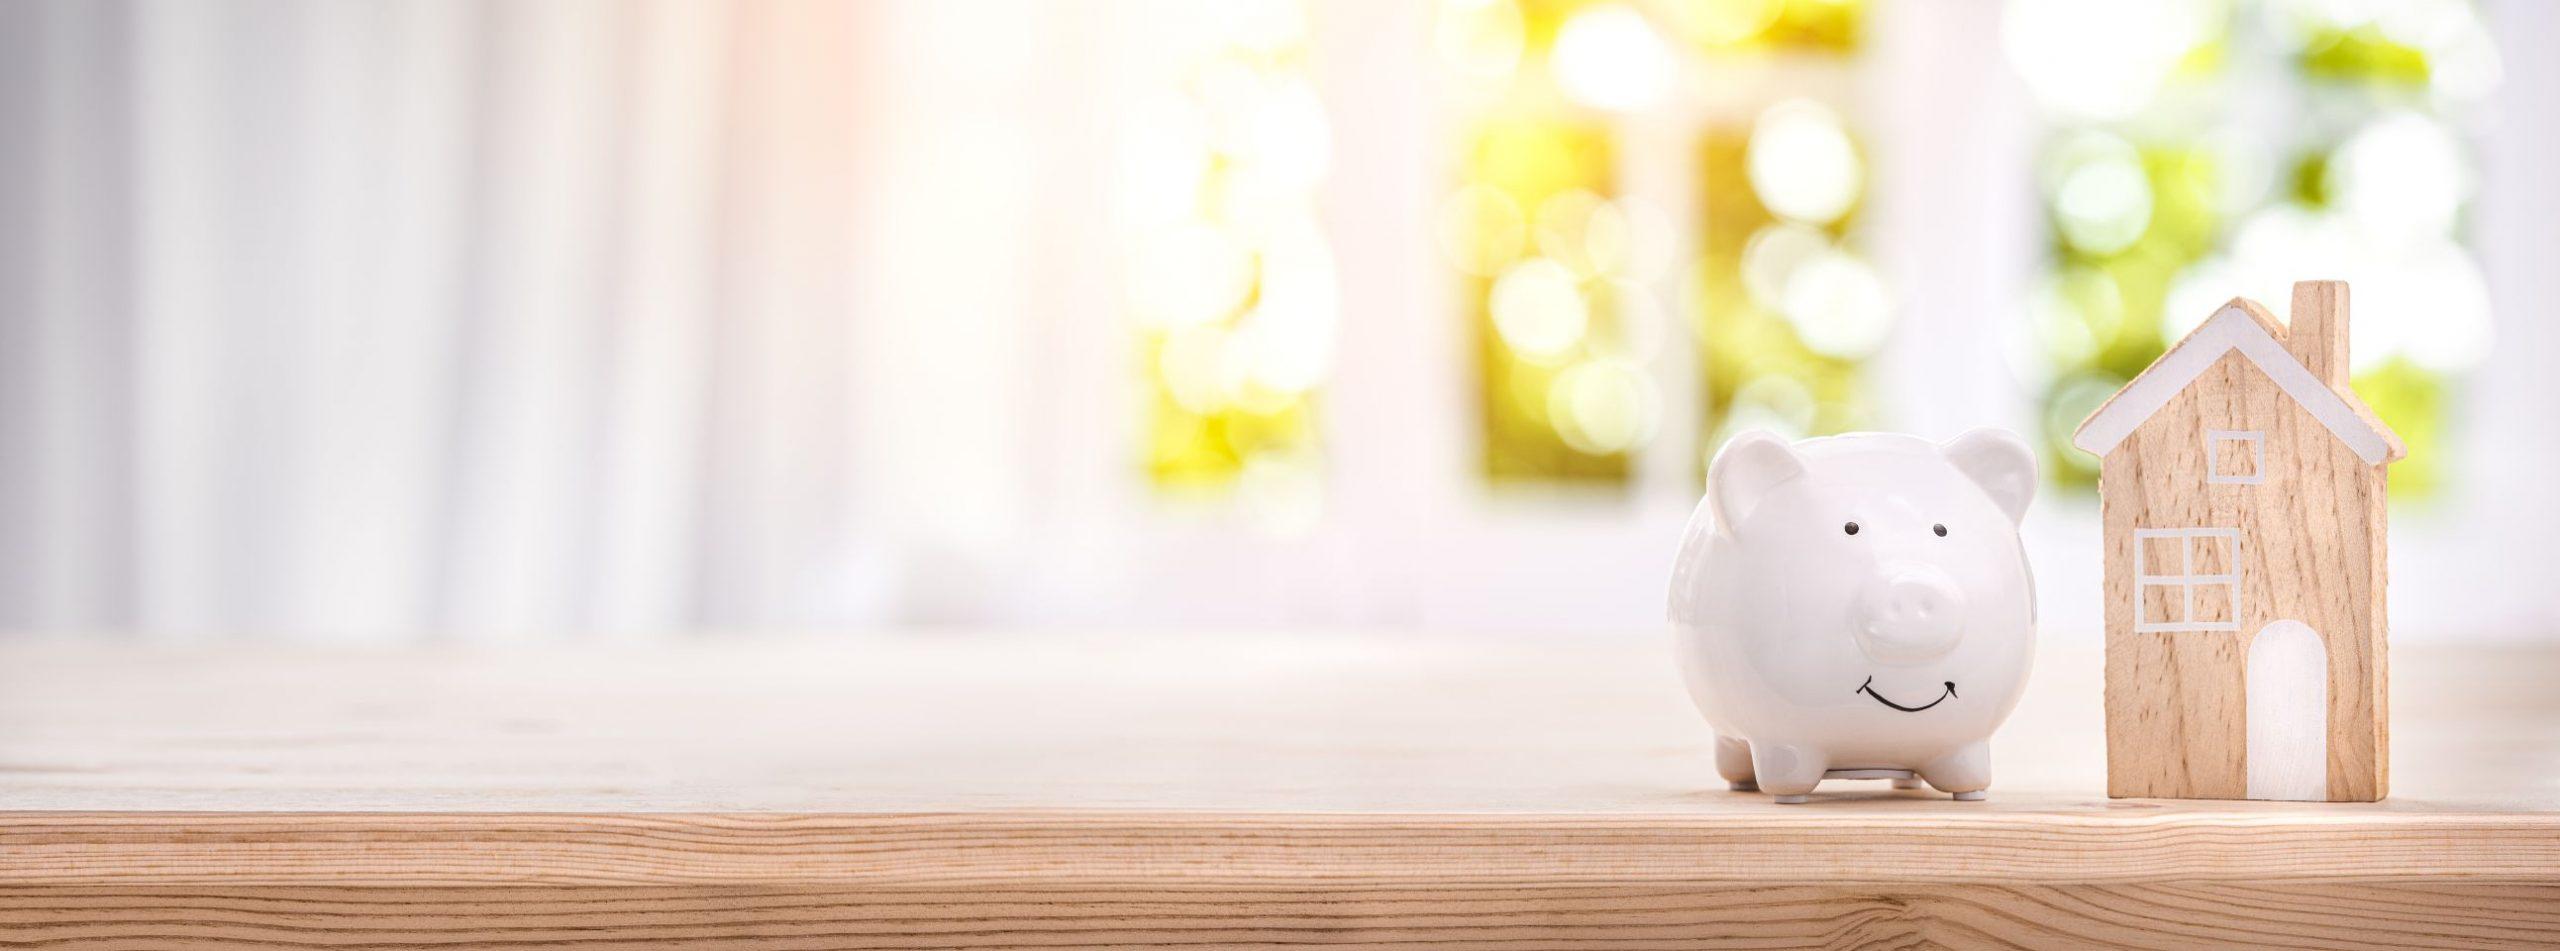 gaspesie prix assurance habitation